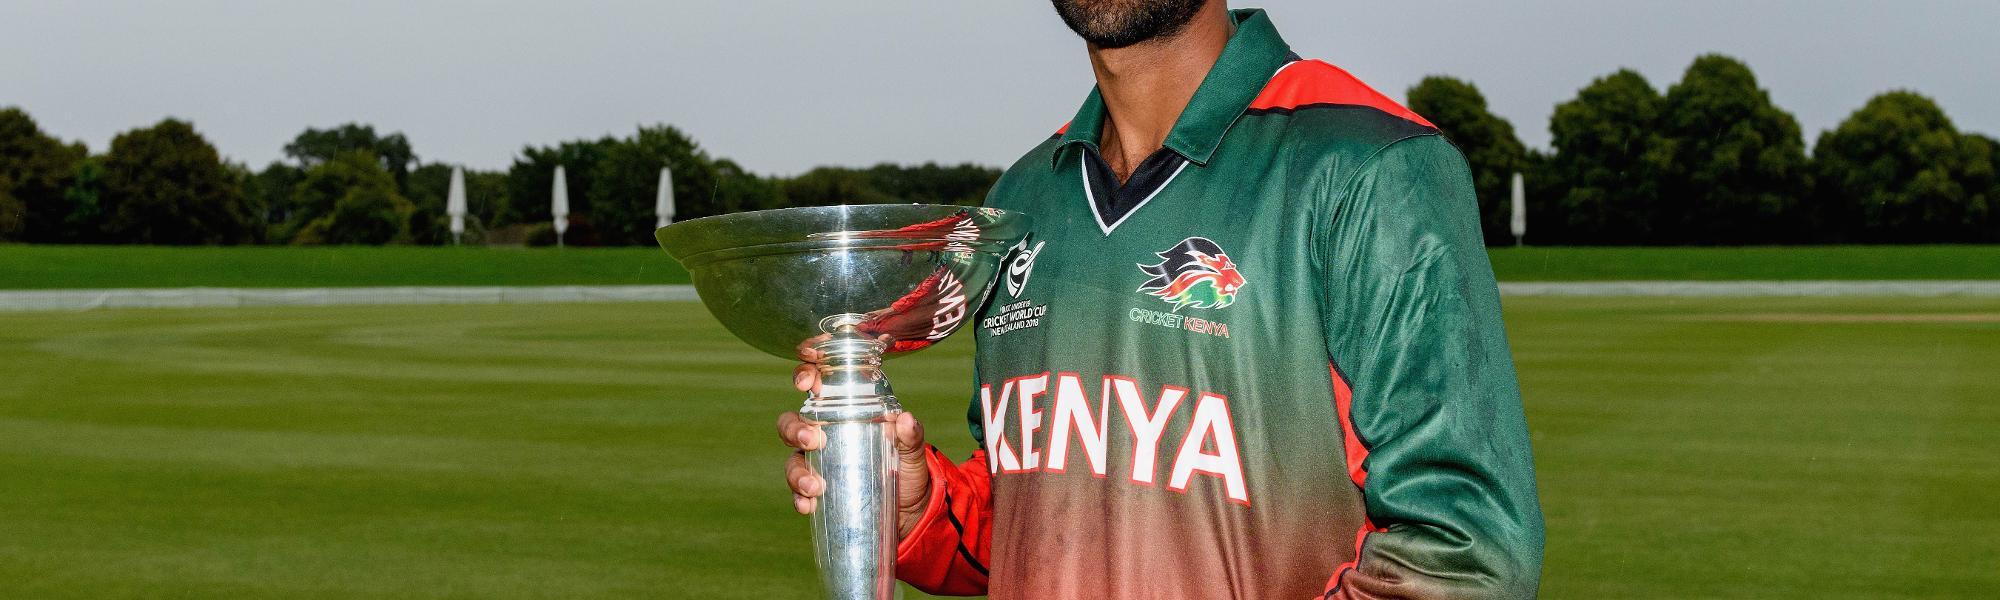 Kenya U19s - Sachin Bhudia